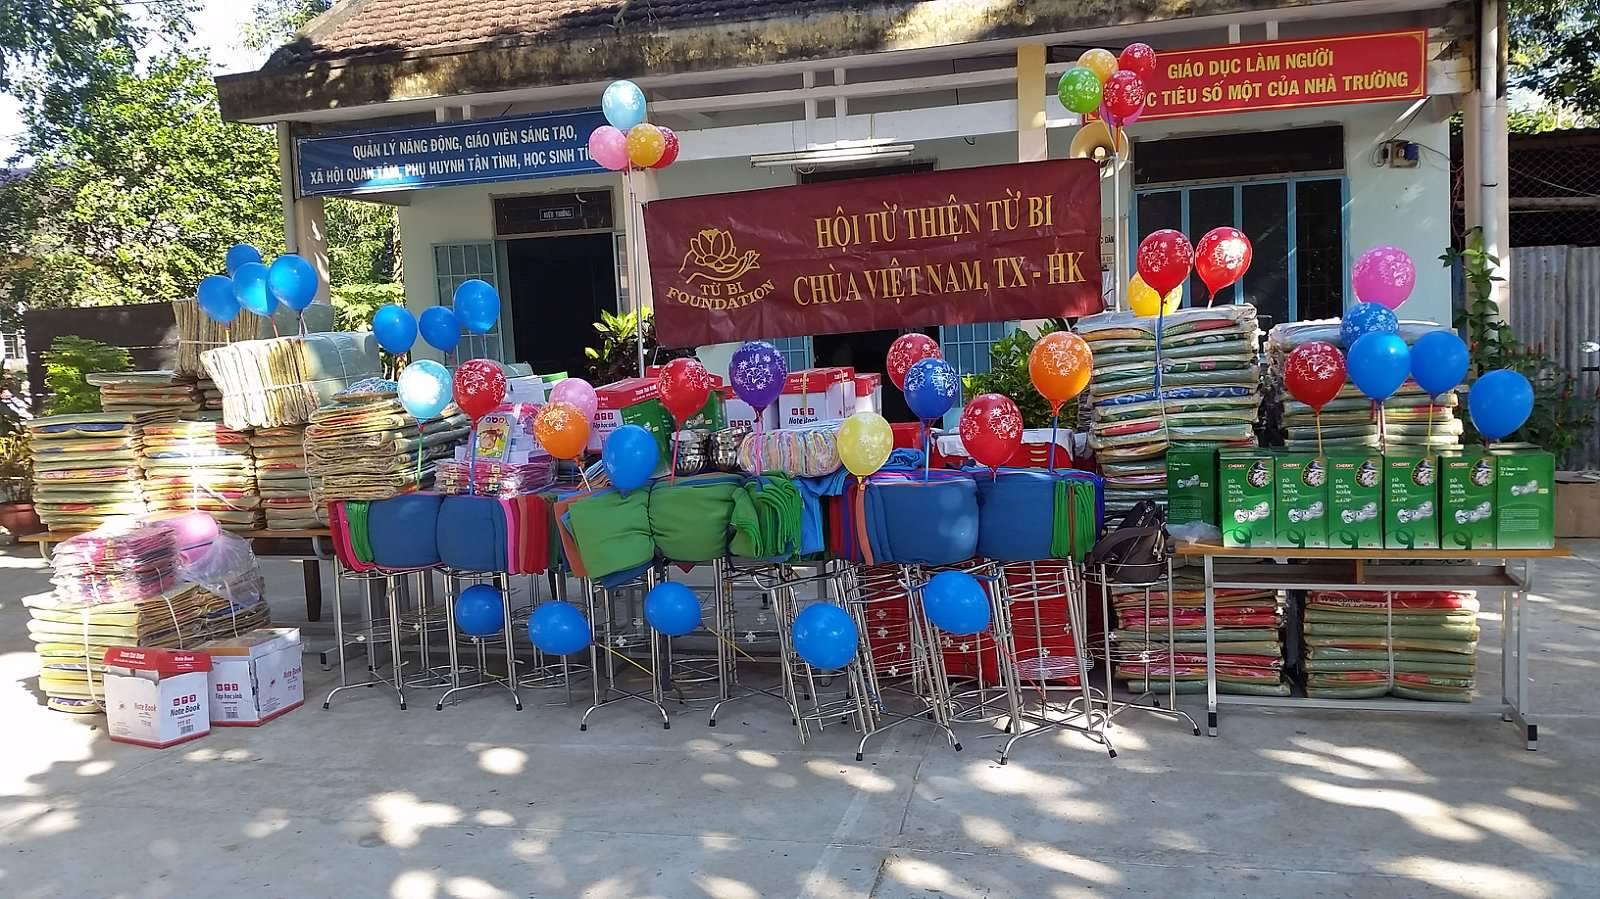 TQ Tieu Hoc Khanh Thuong 26